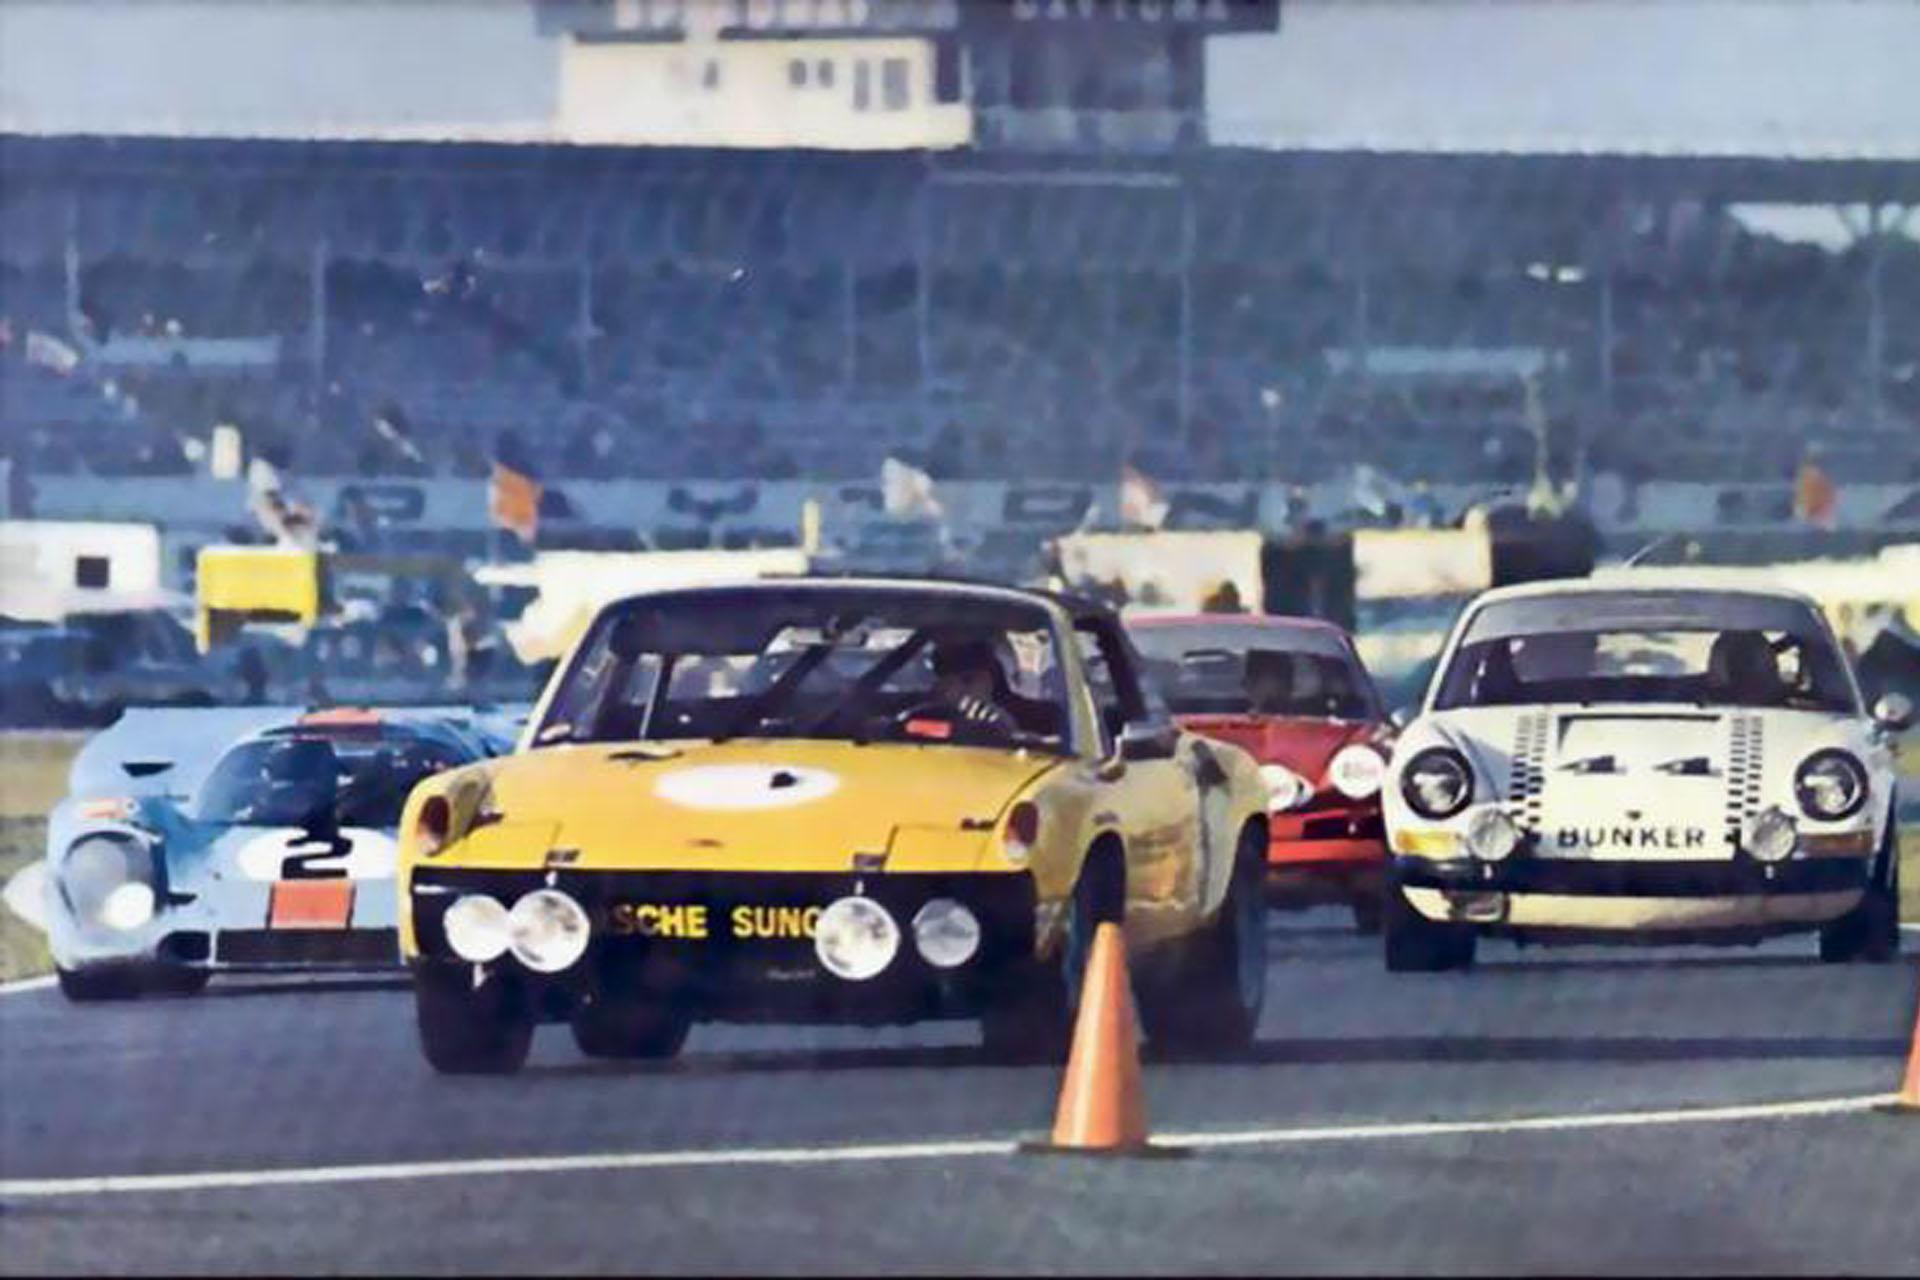 914/6 GT Nachbau des berühmten 24 hours of Daytona